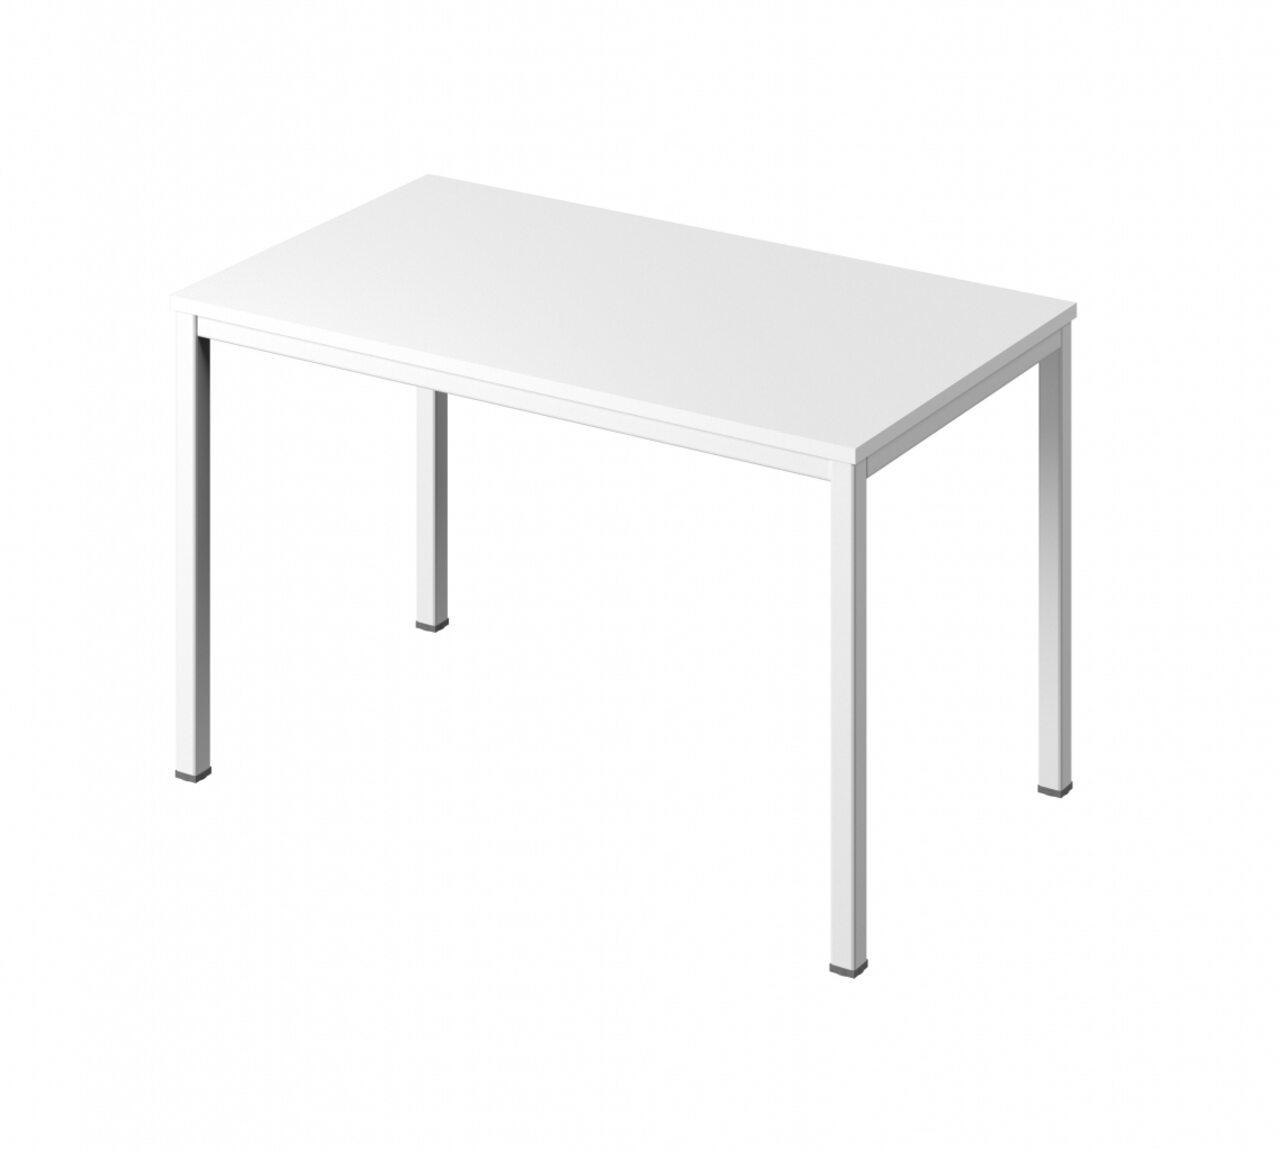 Стол на металлокаркасе без заглушек кабель-канала - фото 1